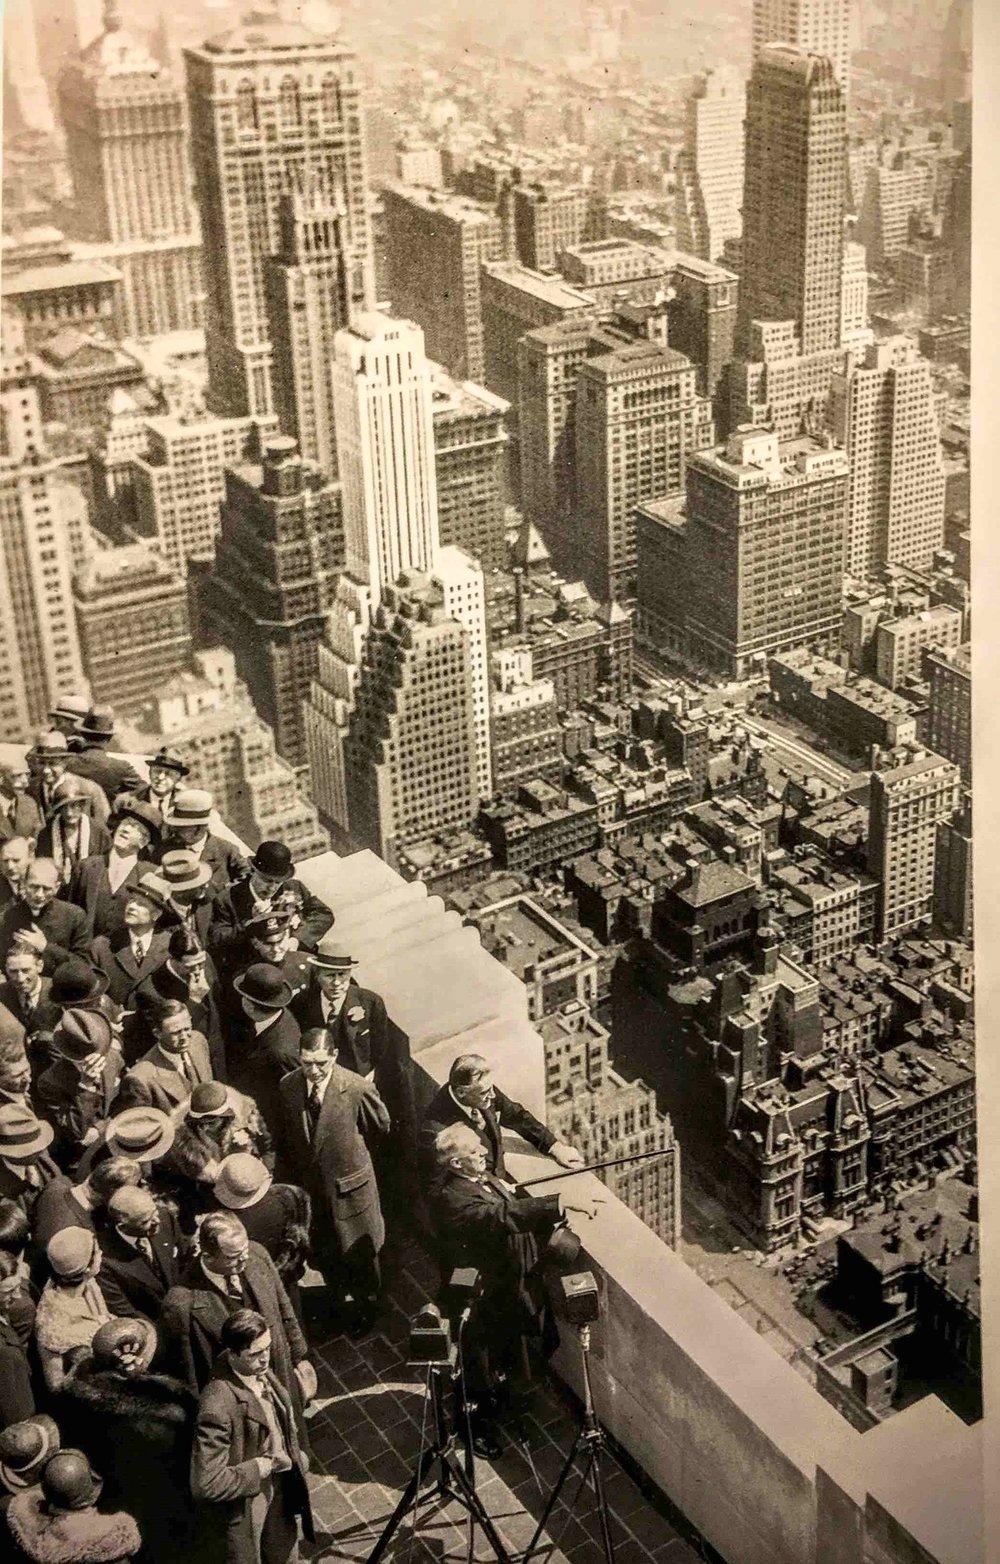 Image: courtesy NYPL